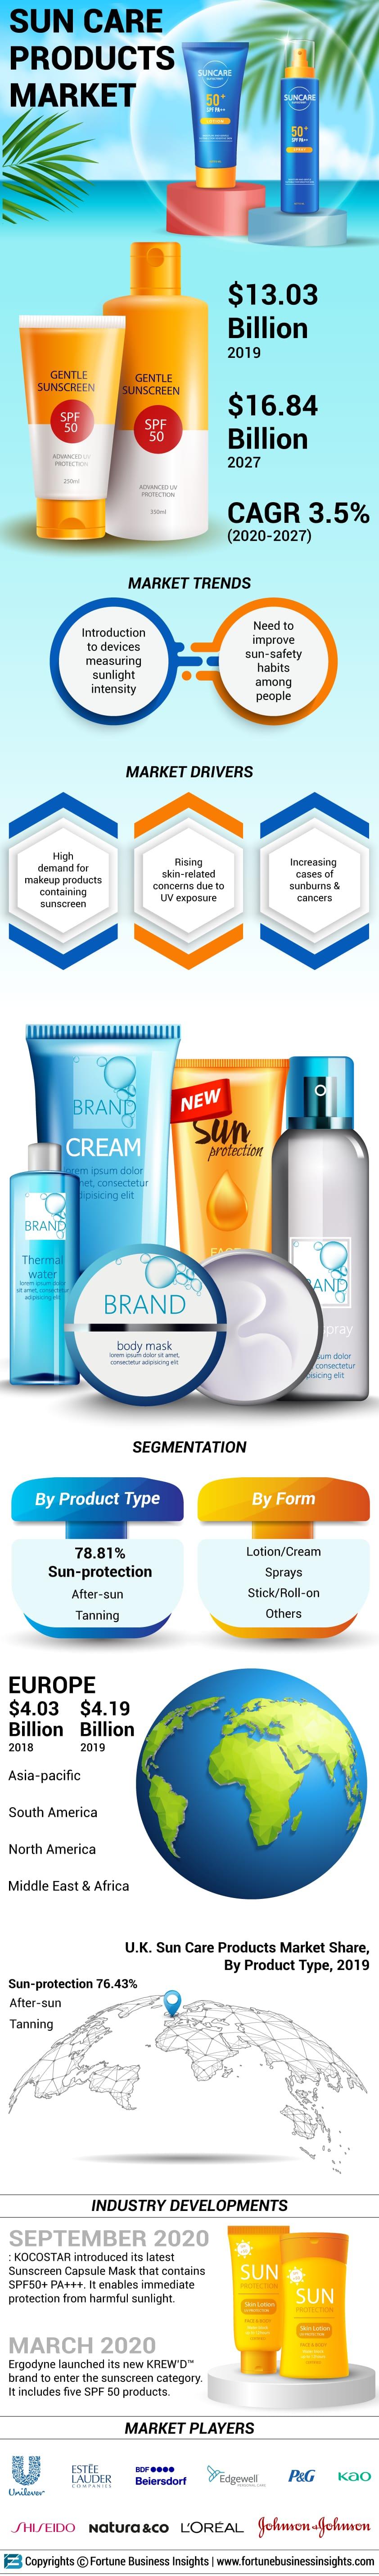 Sun Care Products Market